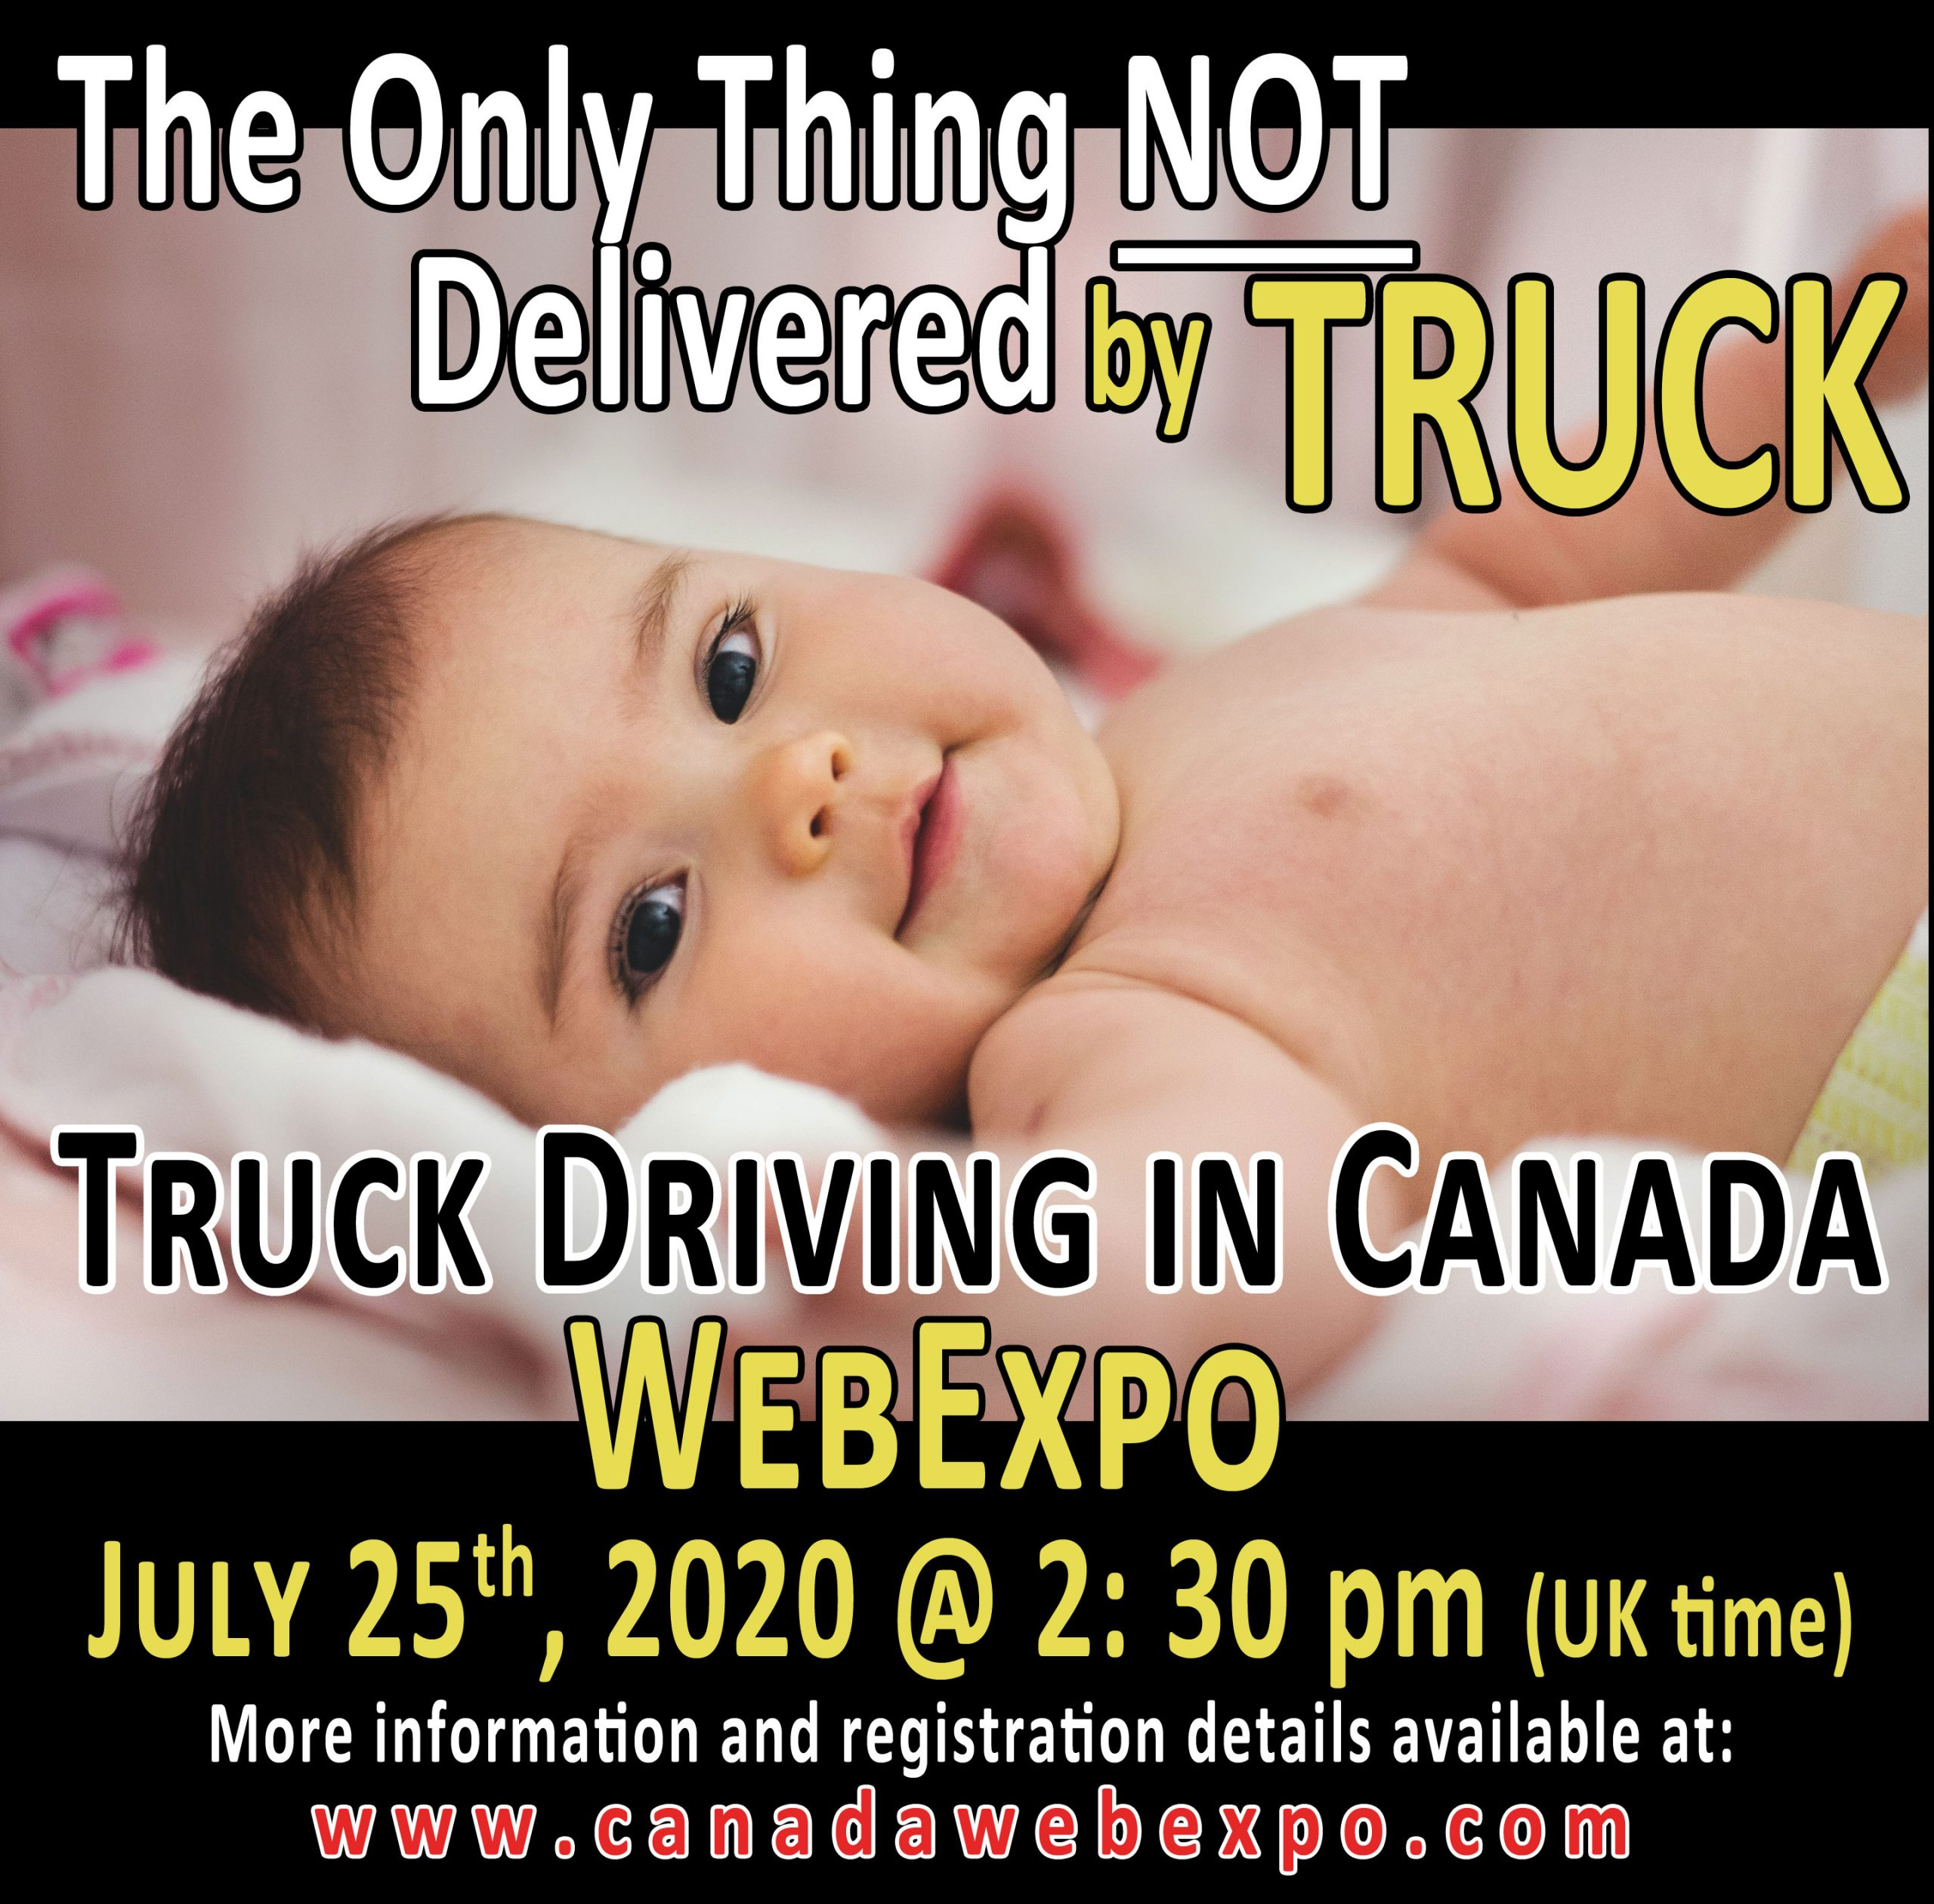 Truck-Advert-Baby-July,-2020